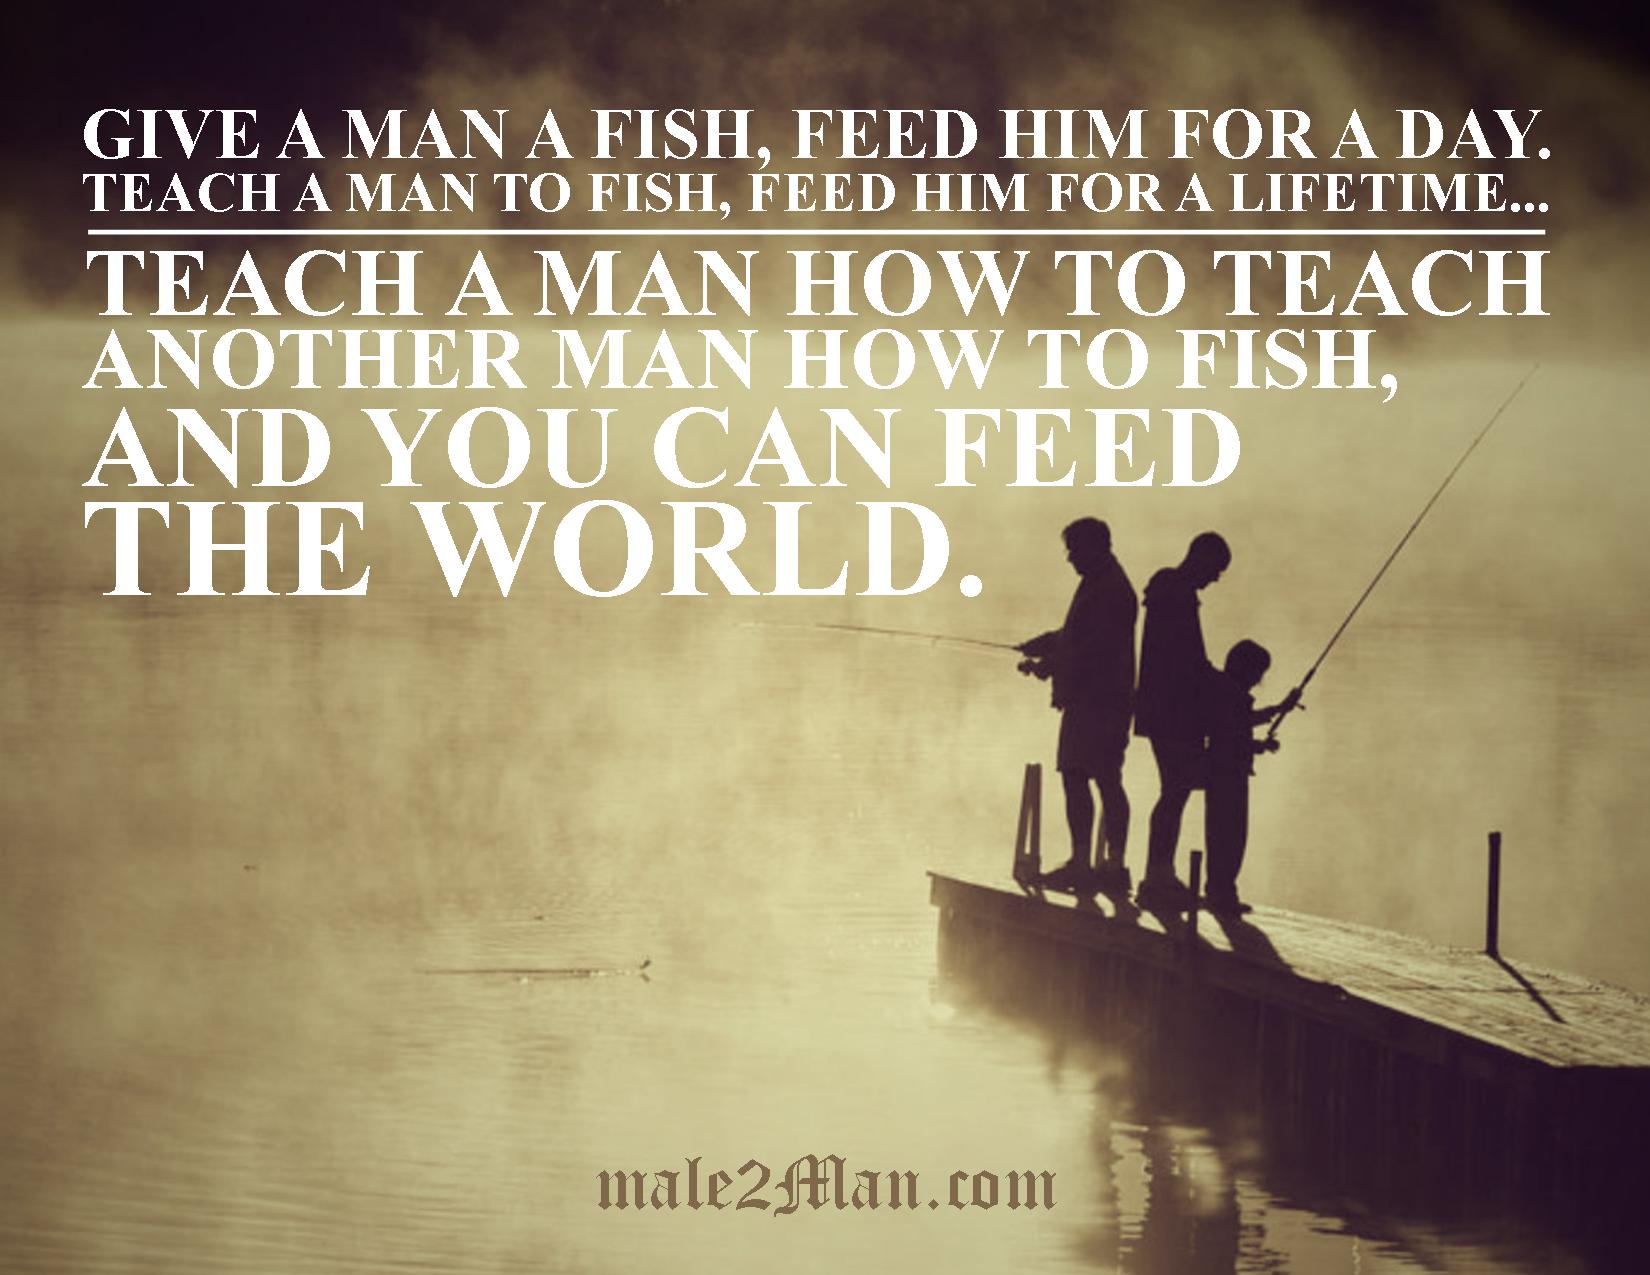 Teach a man to fish male2man for Teach a man to fish bible verse